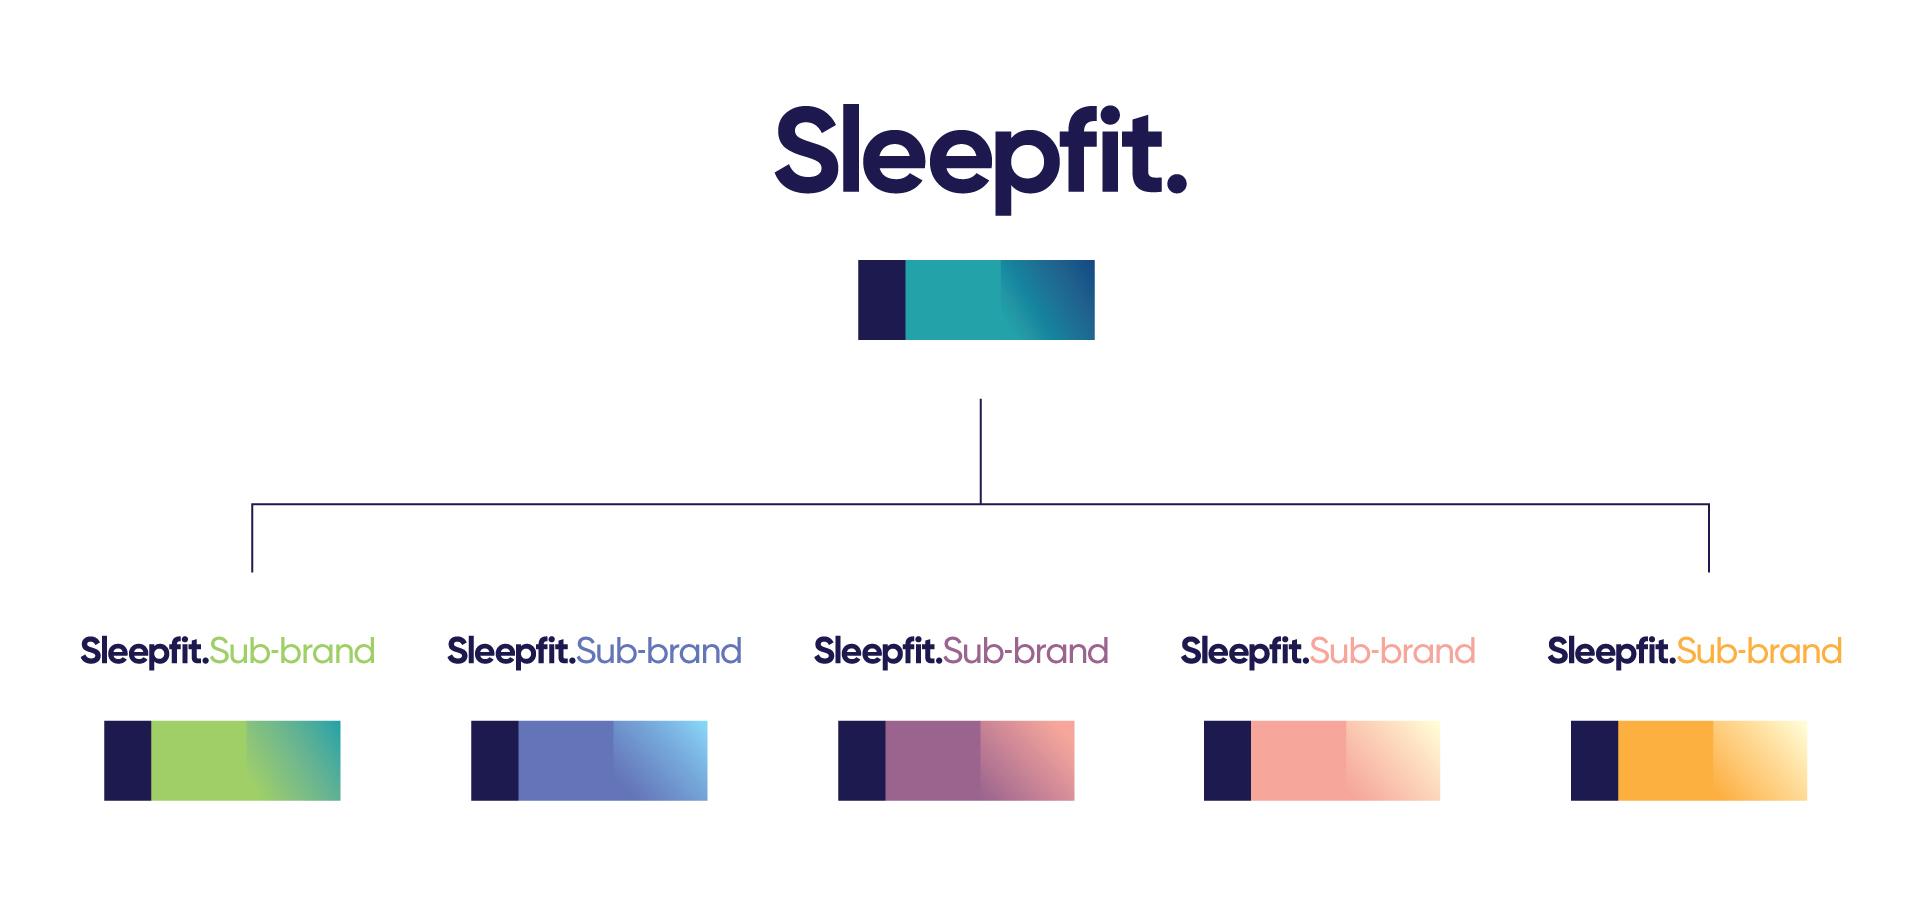 sleepfit_hierarchy.jpg